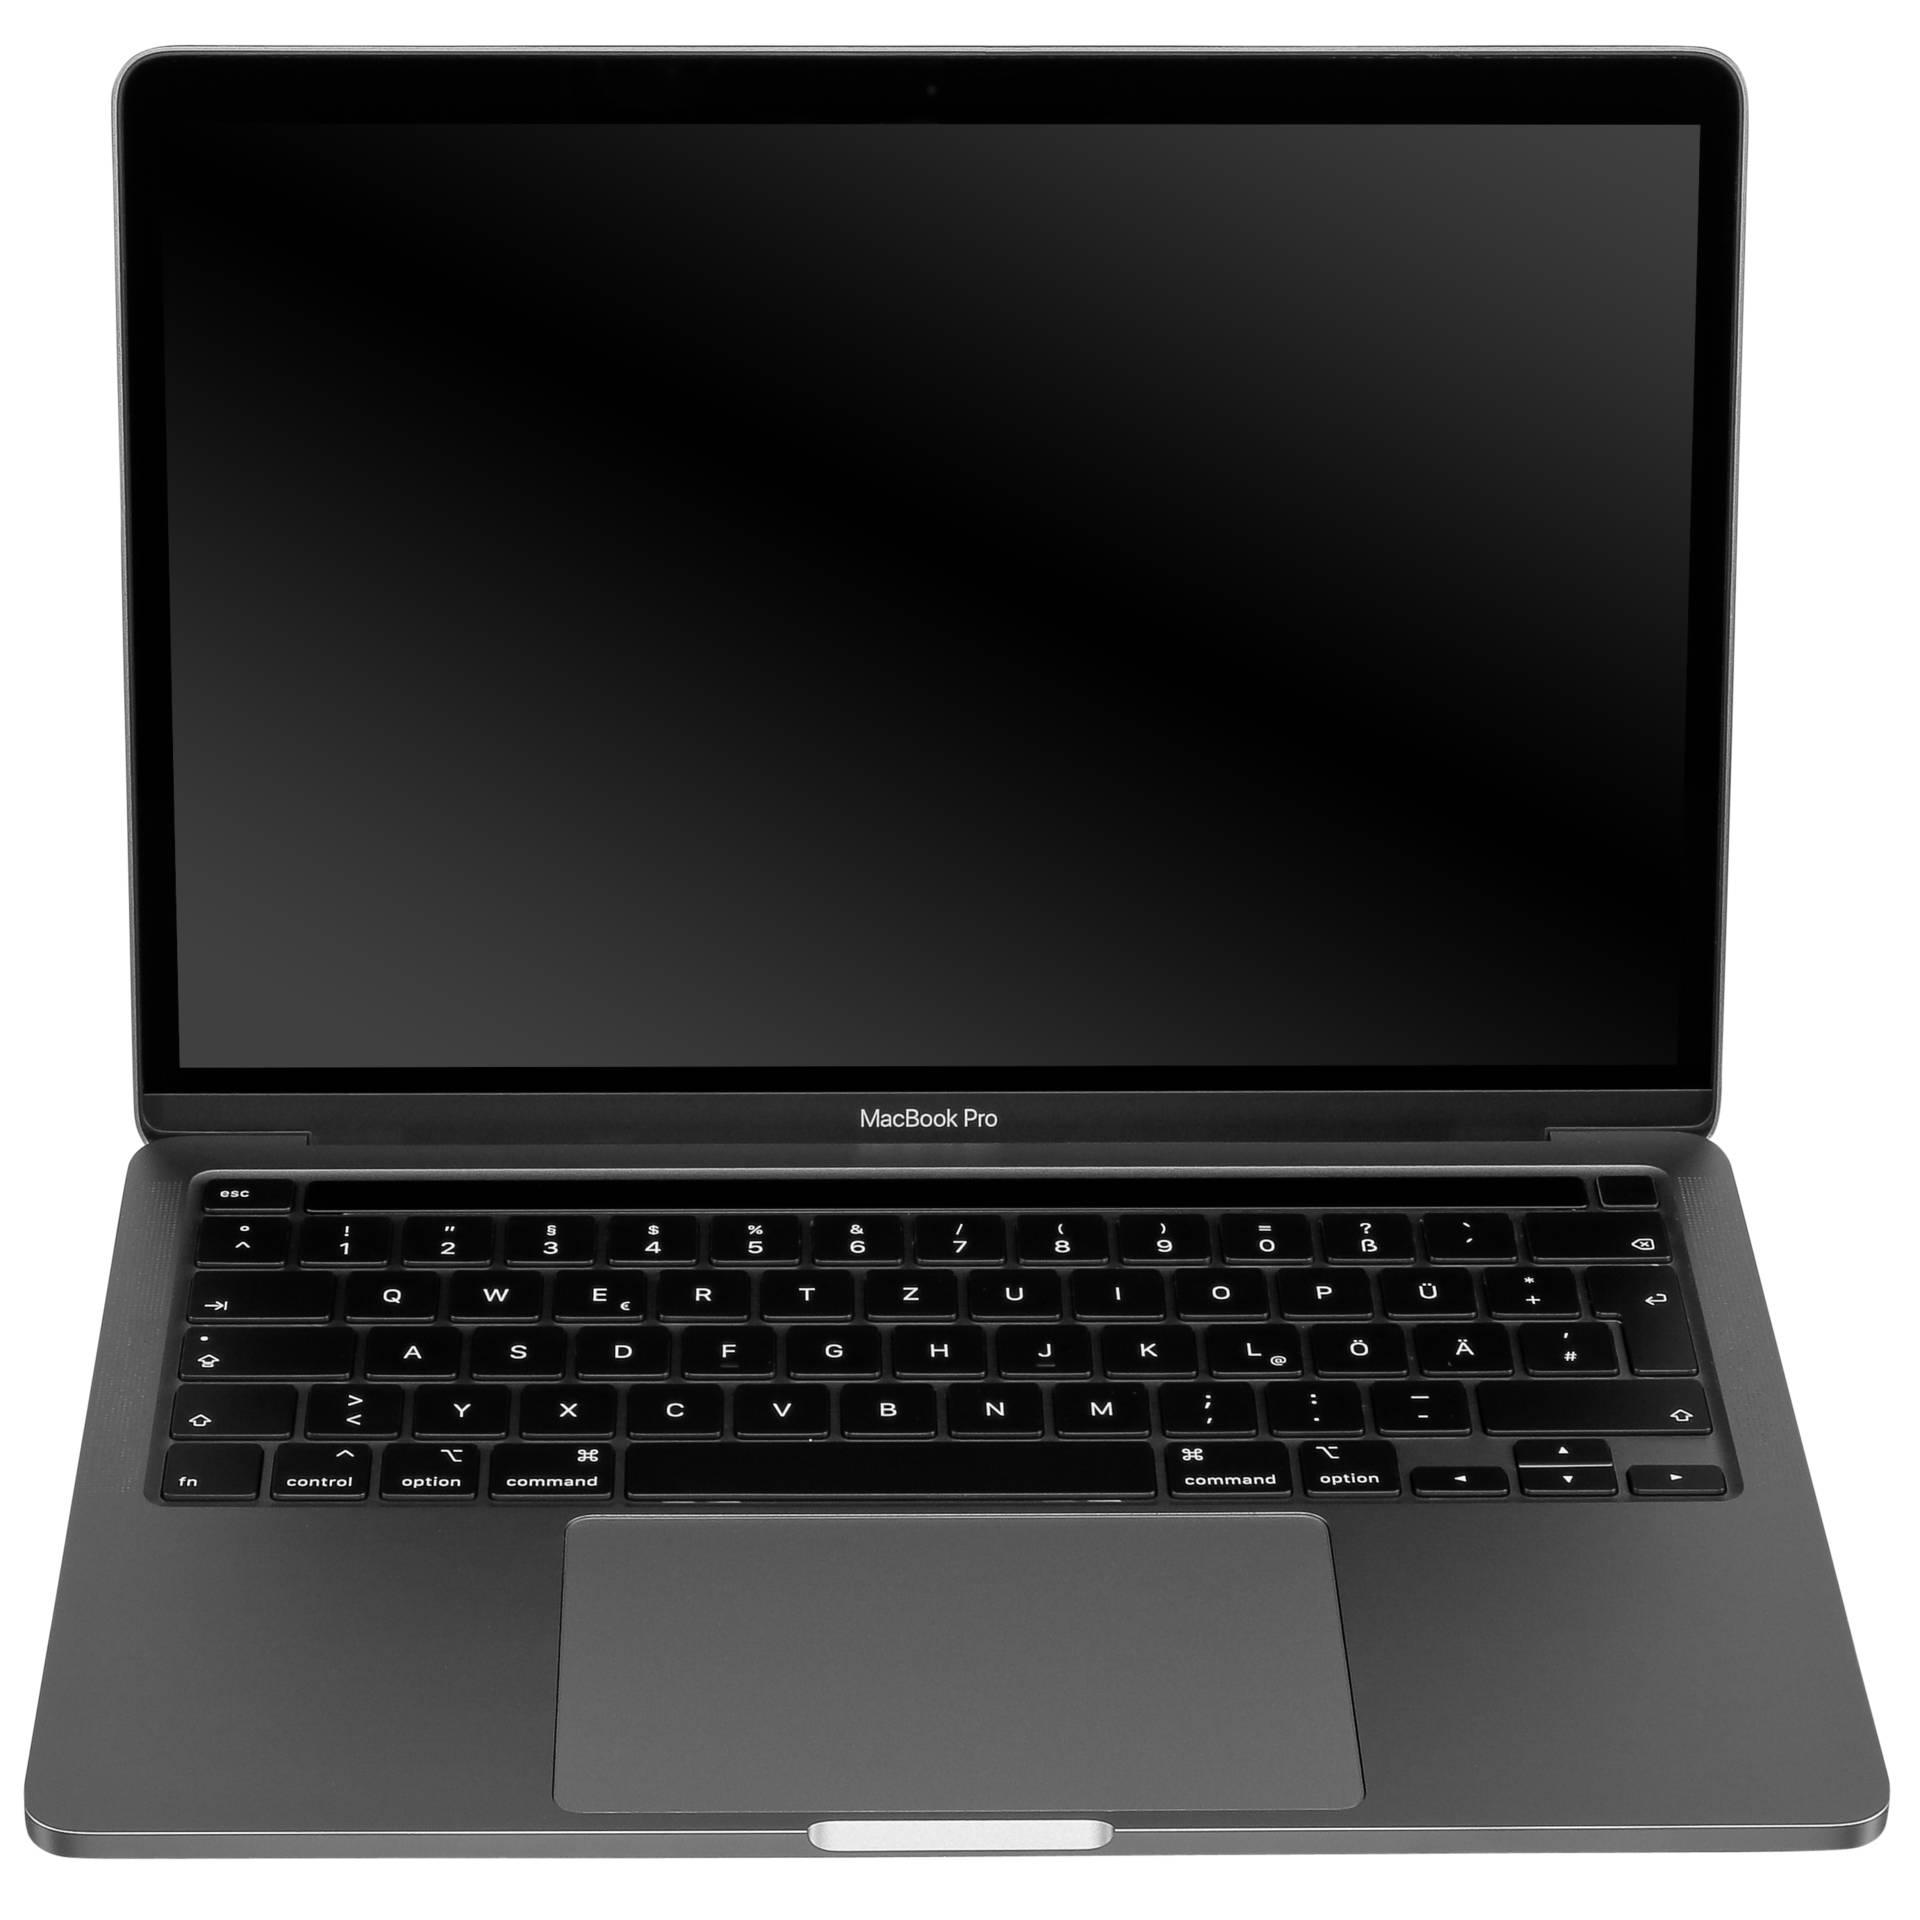 Apple MacBook Pro 13,3 (33,78cm) Ci5 2,0GHz 16GB 512GB Retina